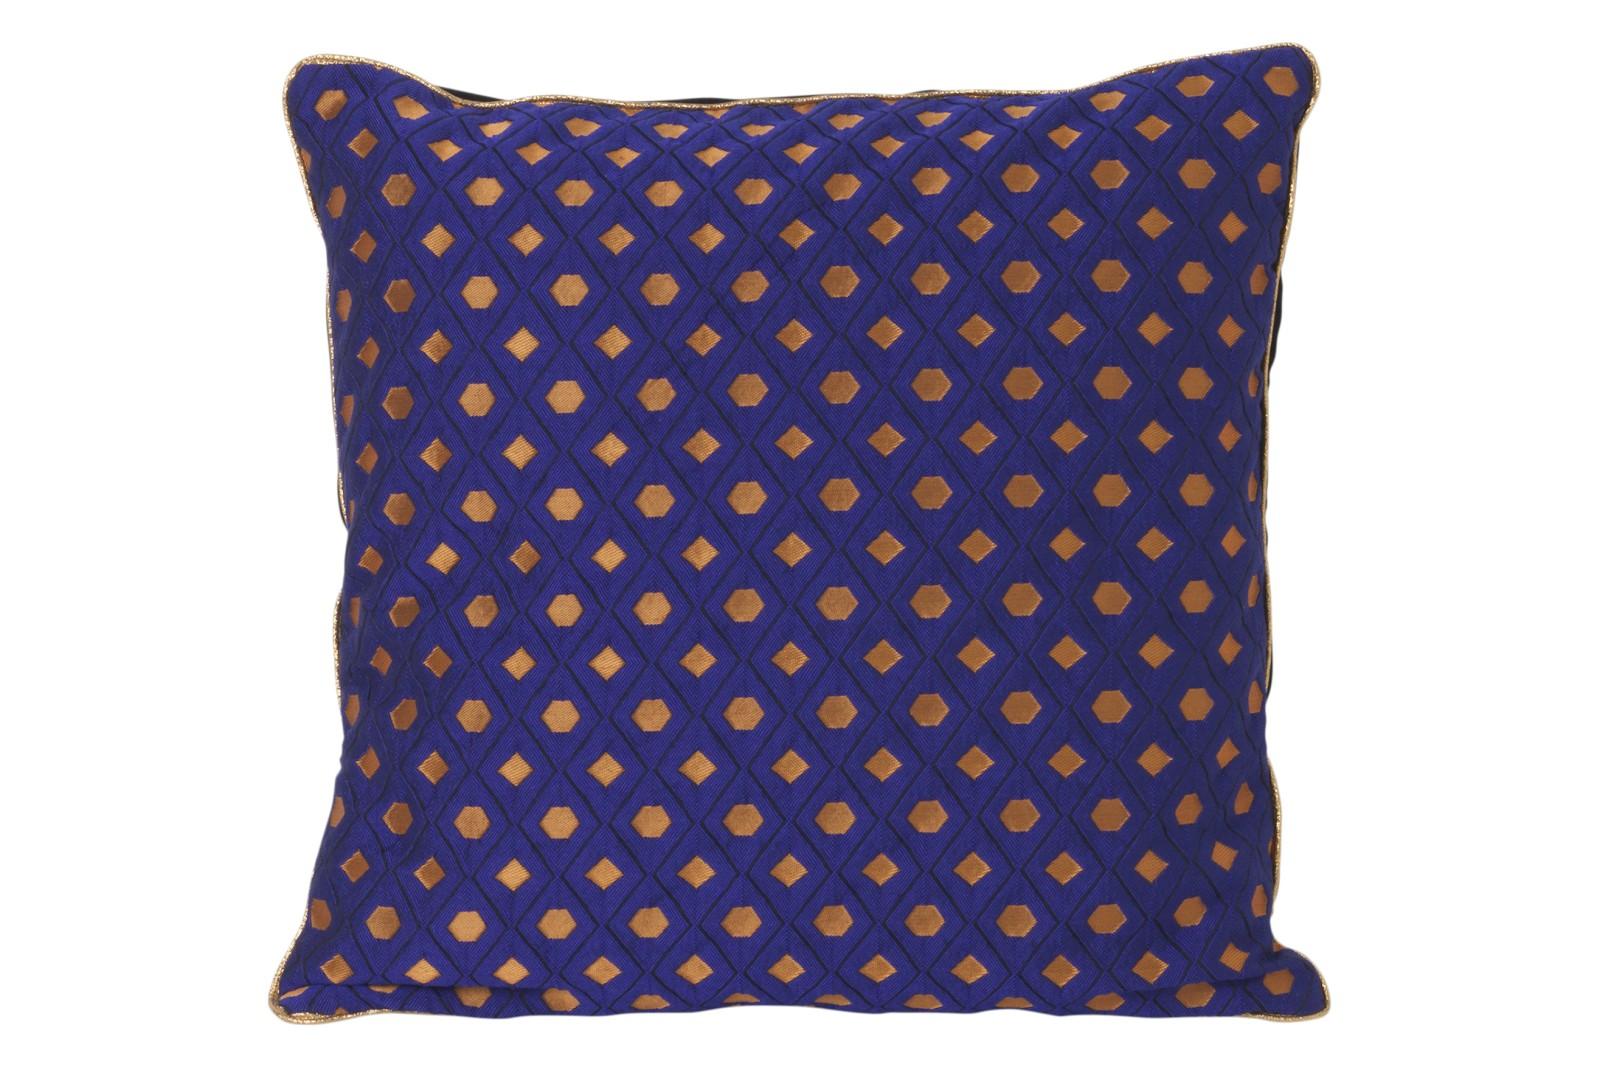 Salon Cushion - Set of 2 Mosaic - Blue, 40 x 40 cm